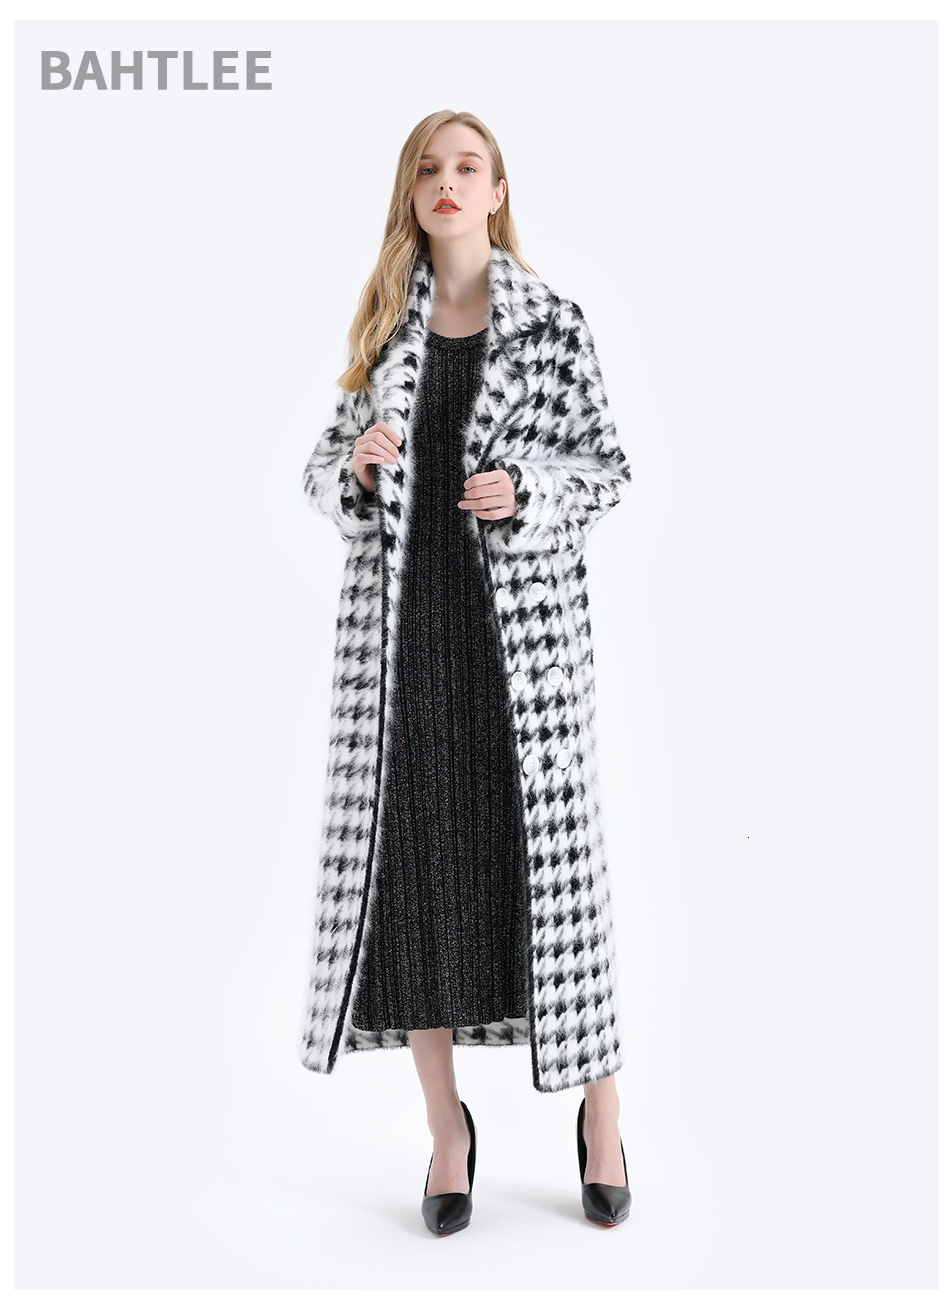 BAHTLEE Women Angora Long Coat Houndstooth Pattern Sweater Winter Wool Knitted Cardigans Jumper Turn Down Collar Long Sleeves 5